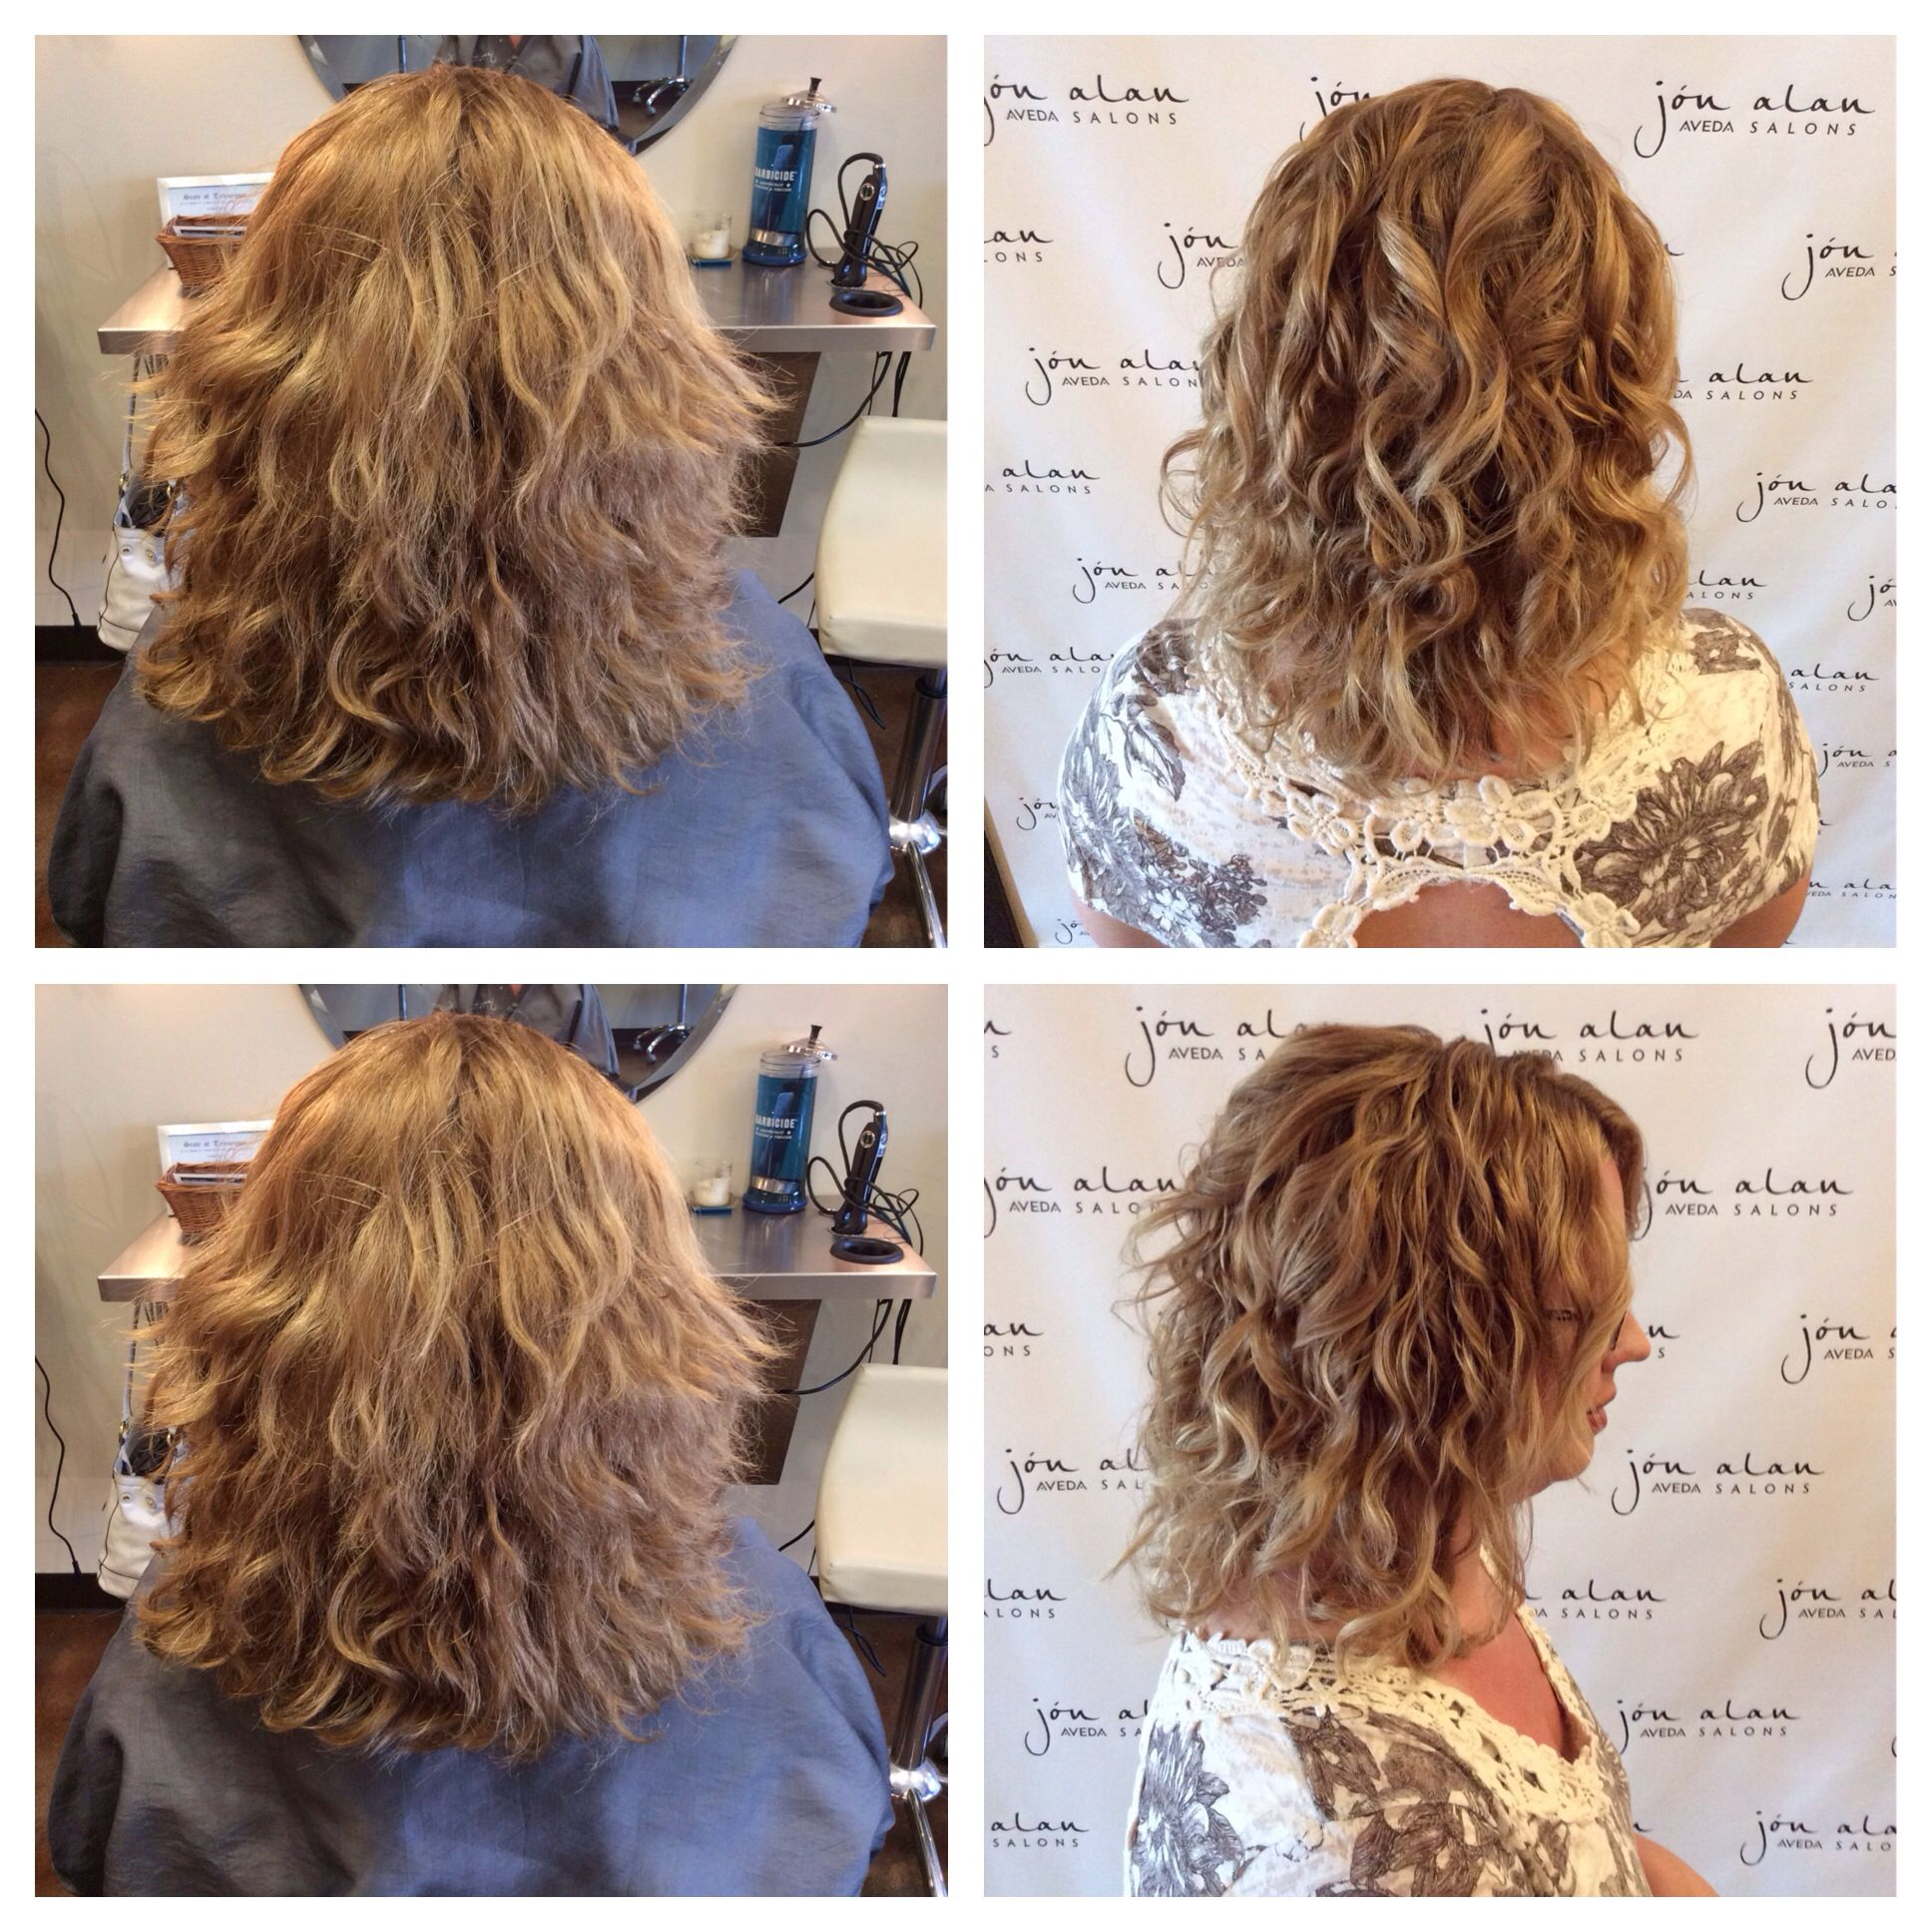 Enhance your curls